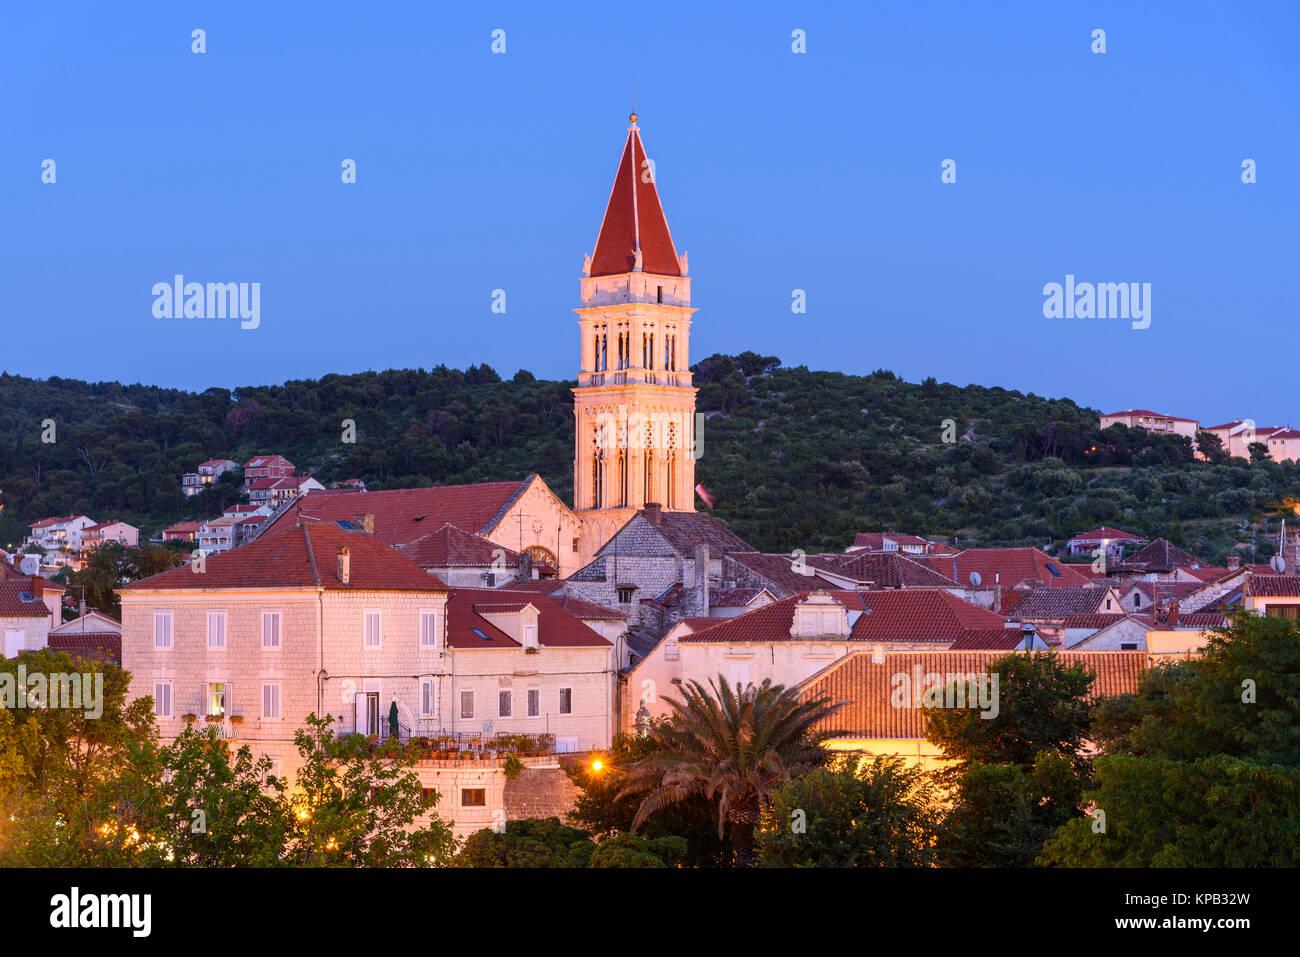 Dusk over Trogir Old Town, Croatia - Stock Image